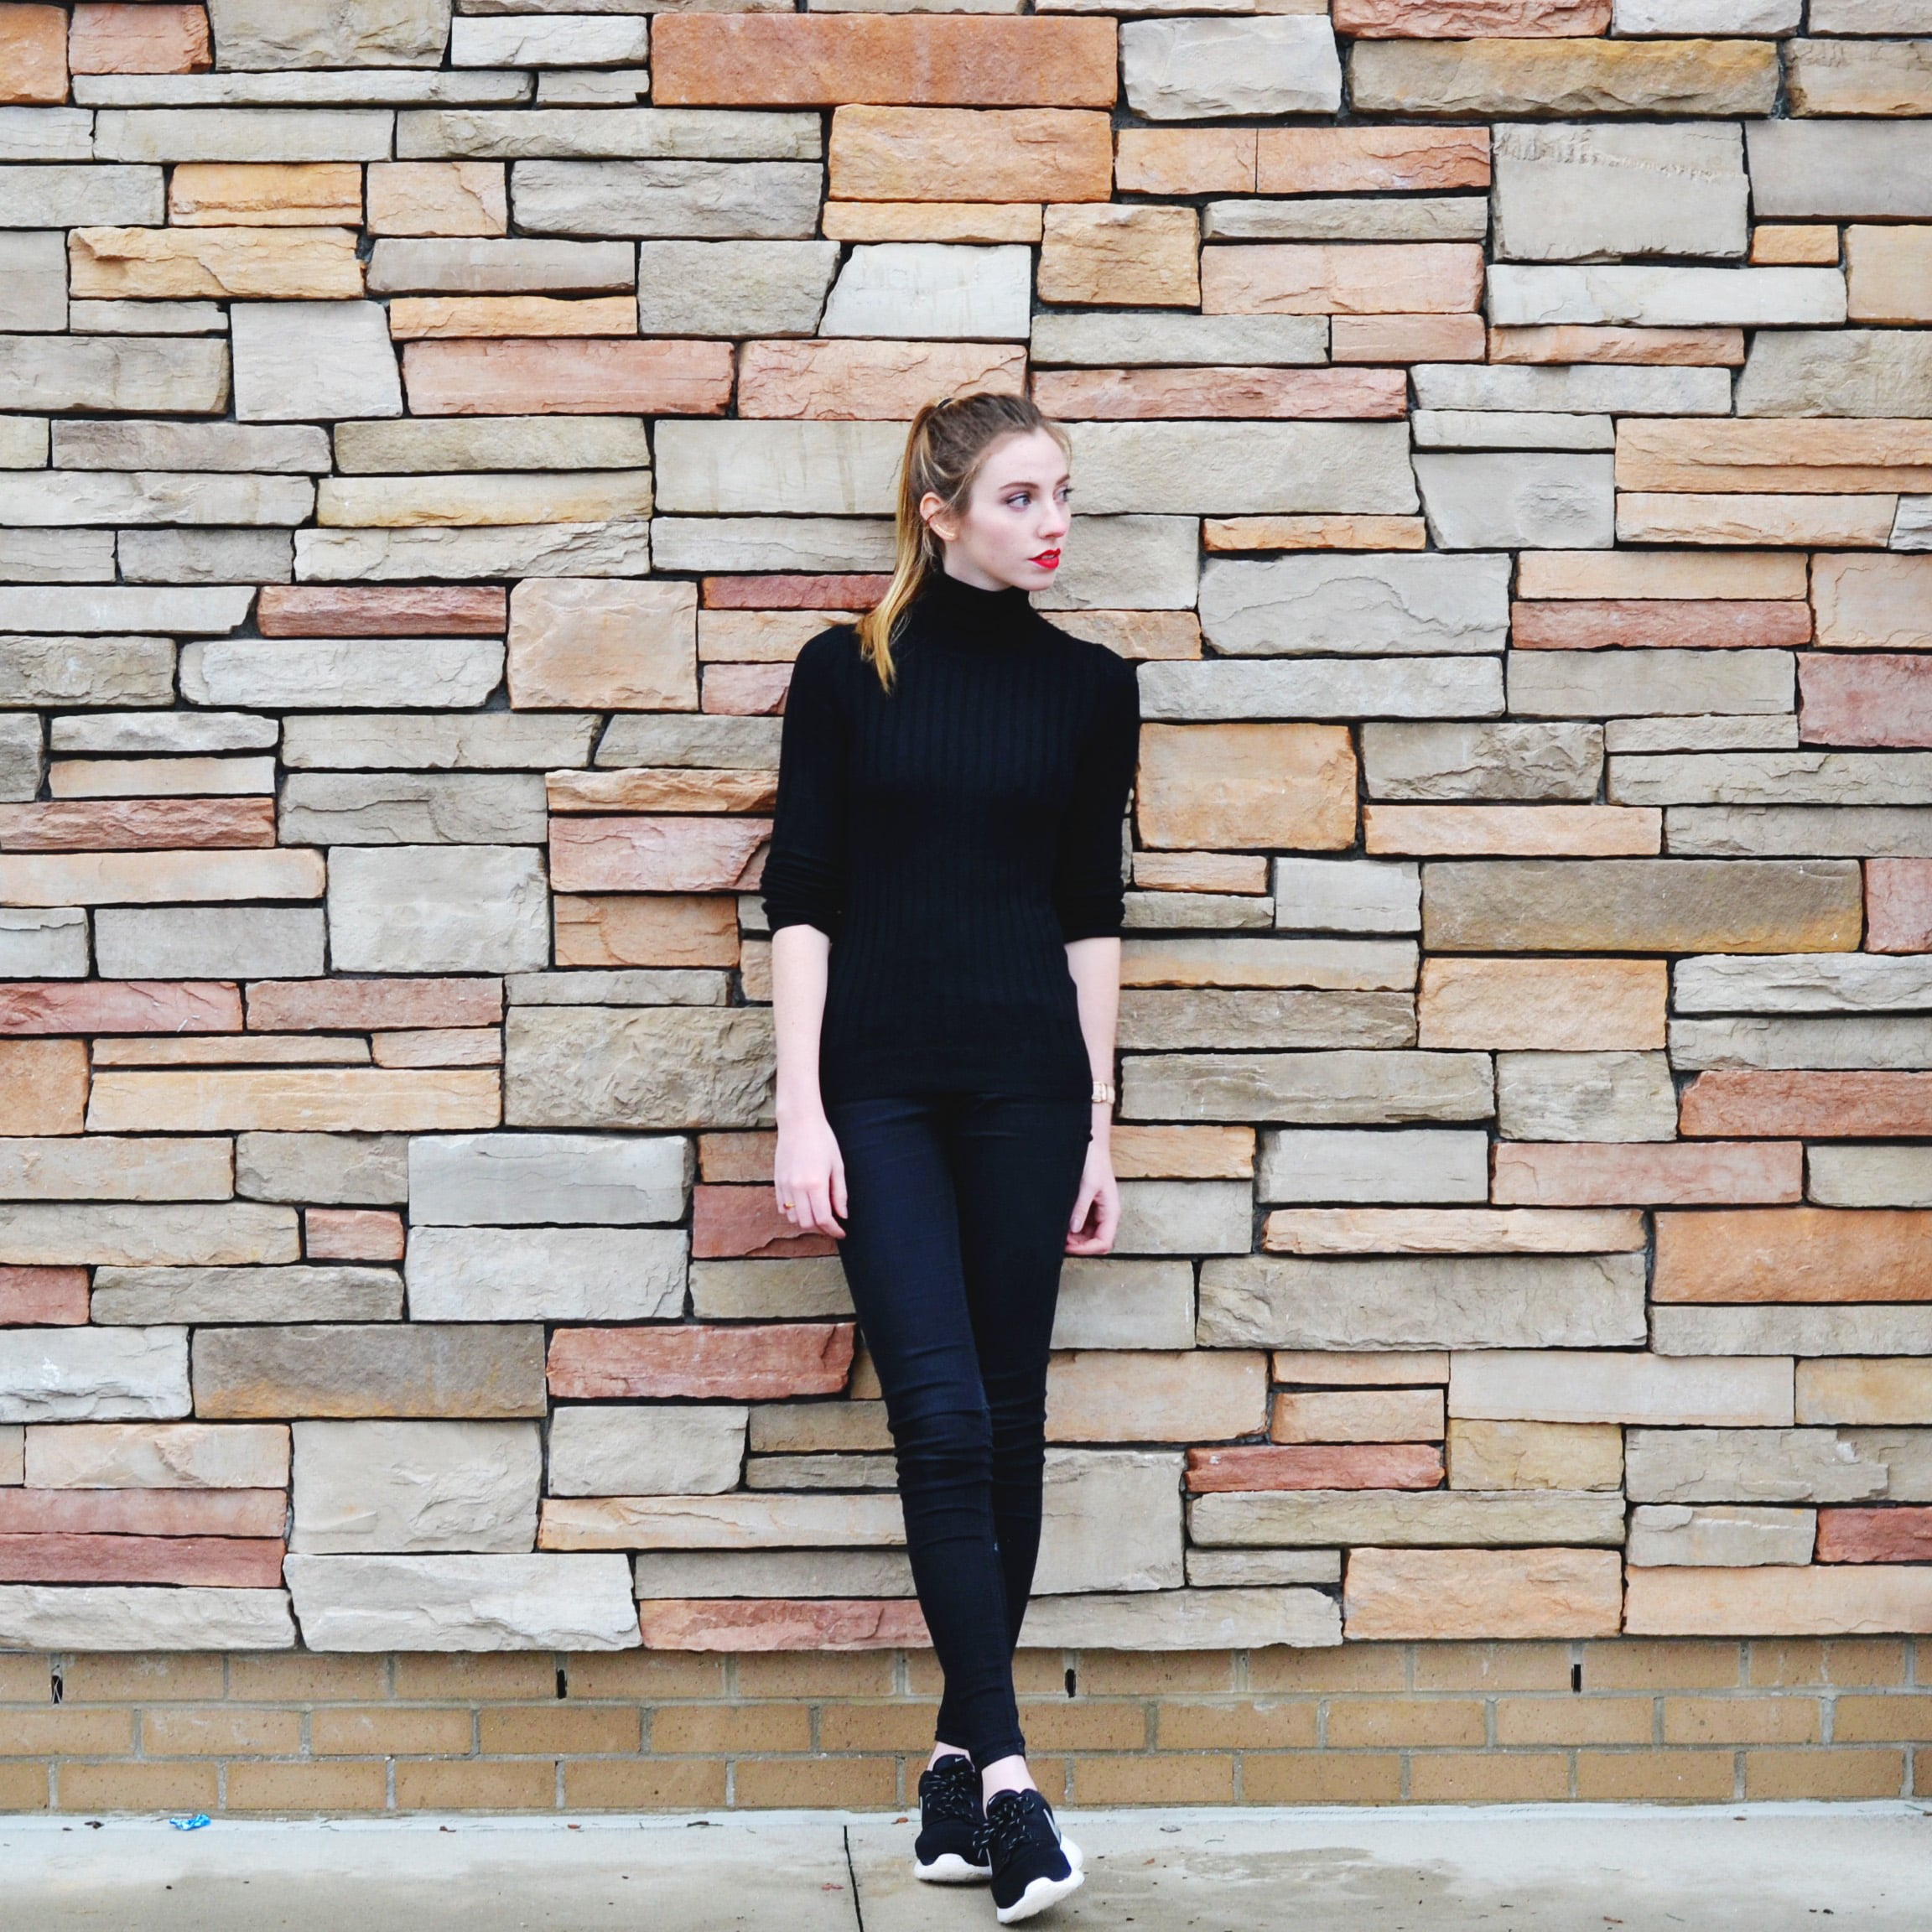 Black Turtleneck Outfit (via Girl x Garment)